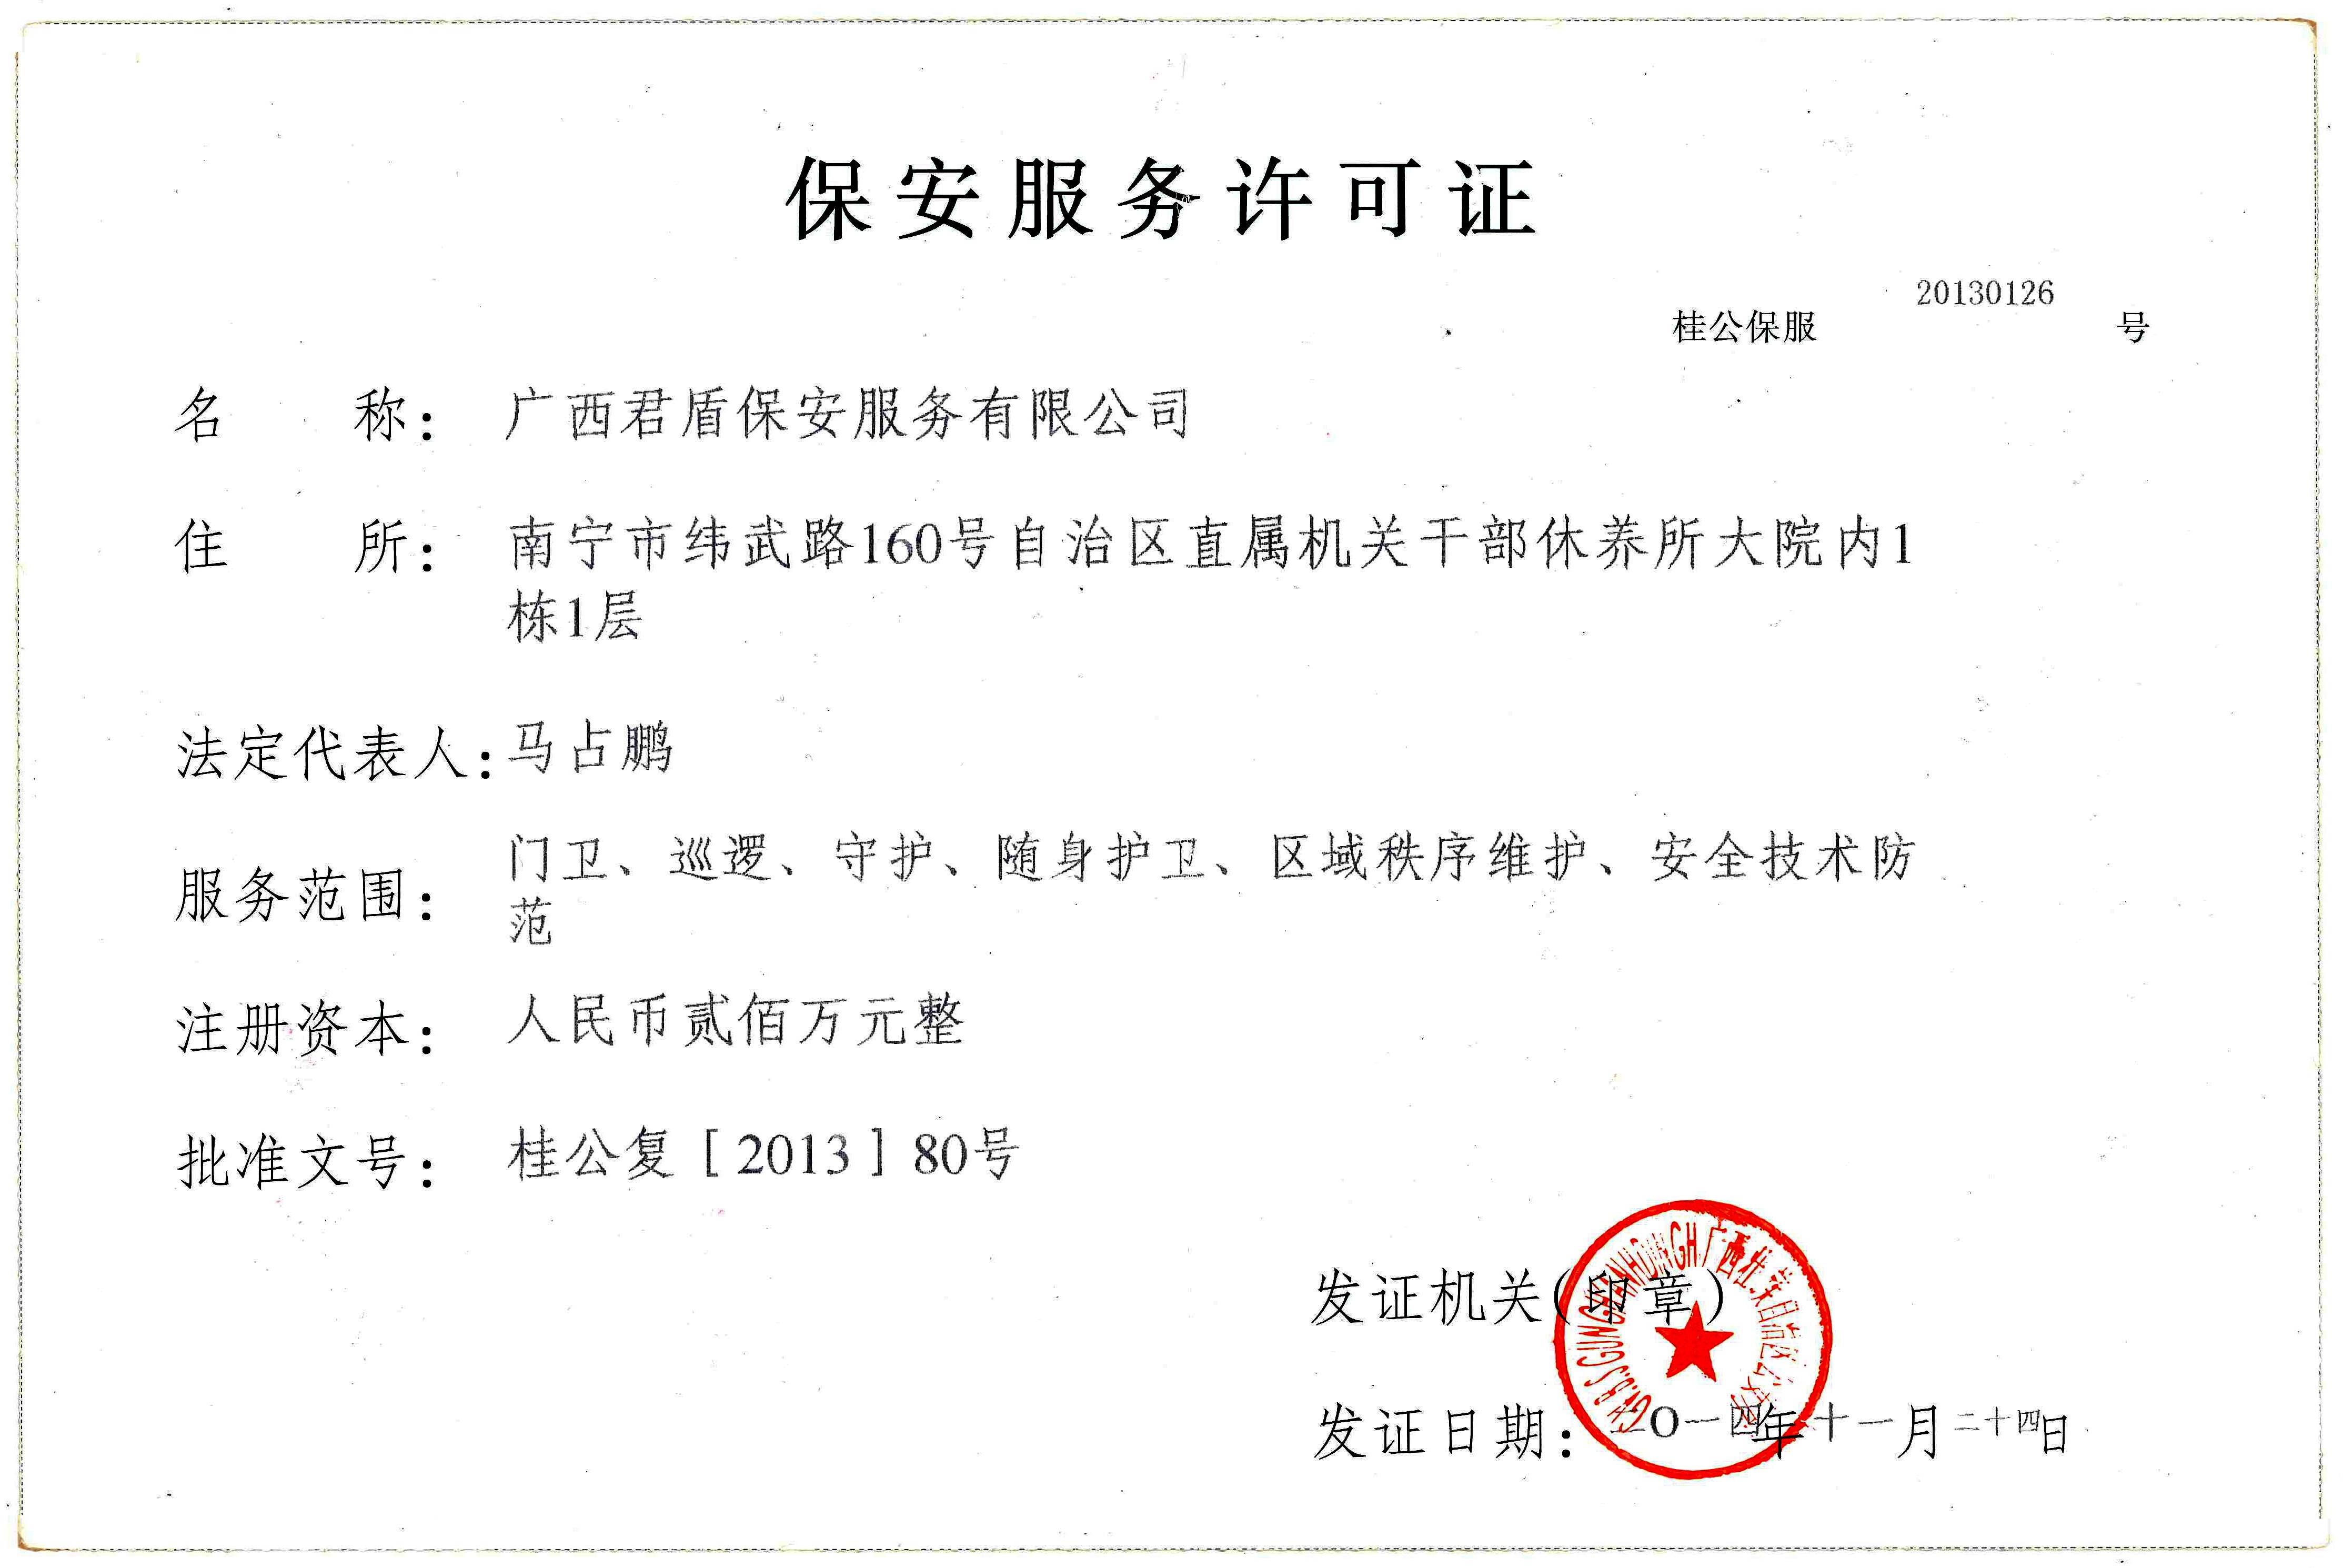 betvictor官网服务许可证